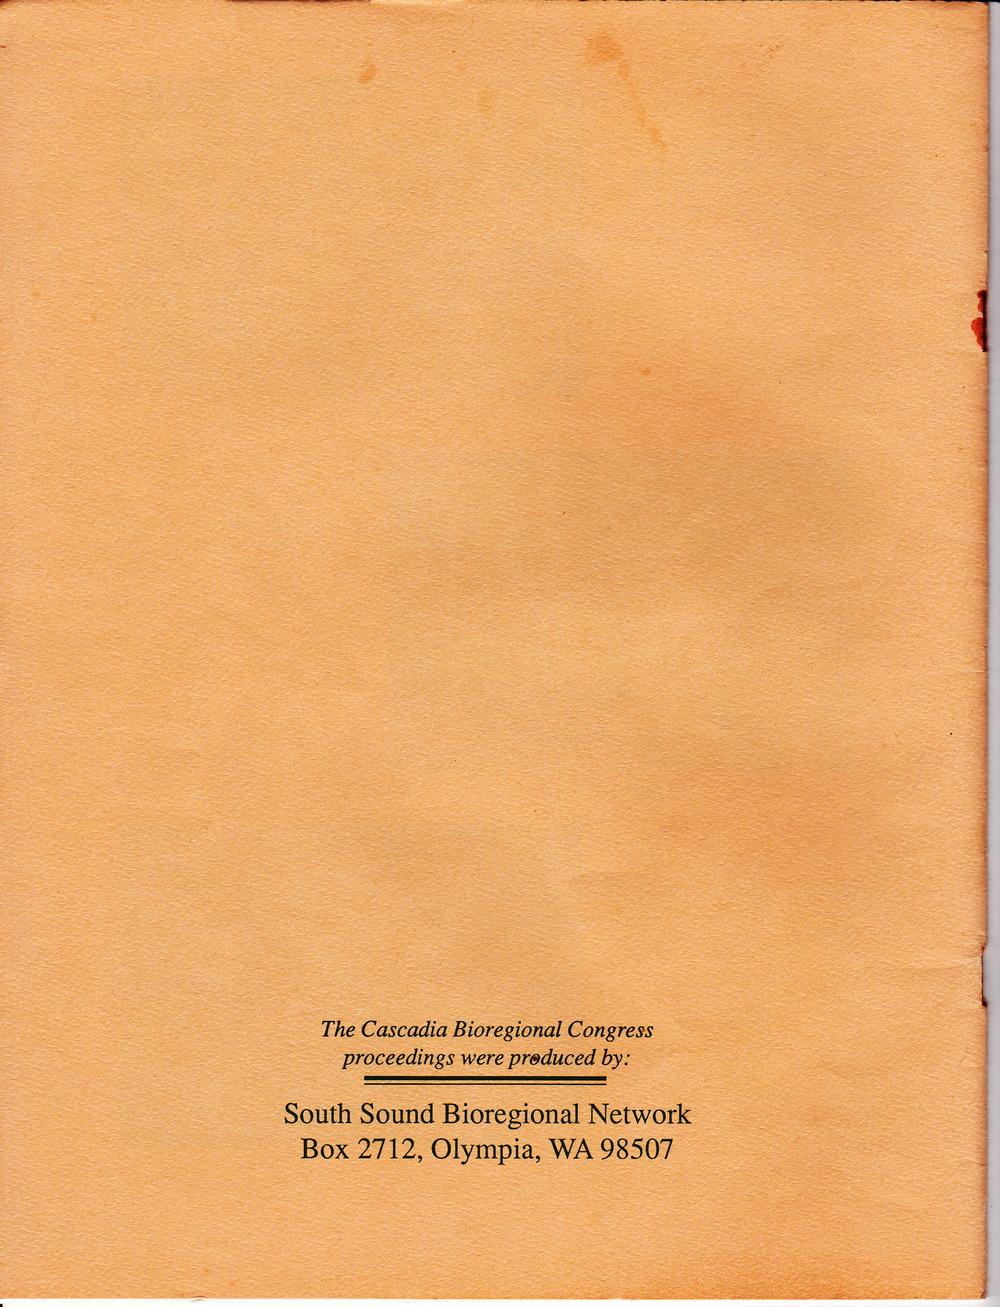 Cascadia Bioregional Congress 1986 Proceedings_0015.jpg